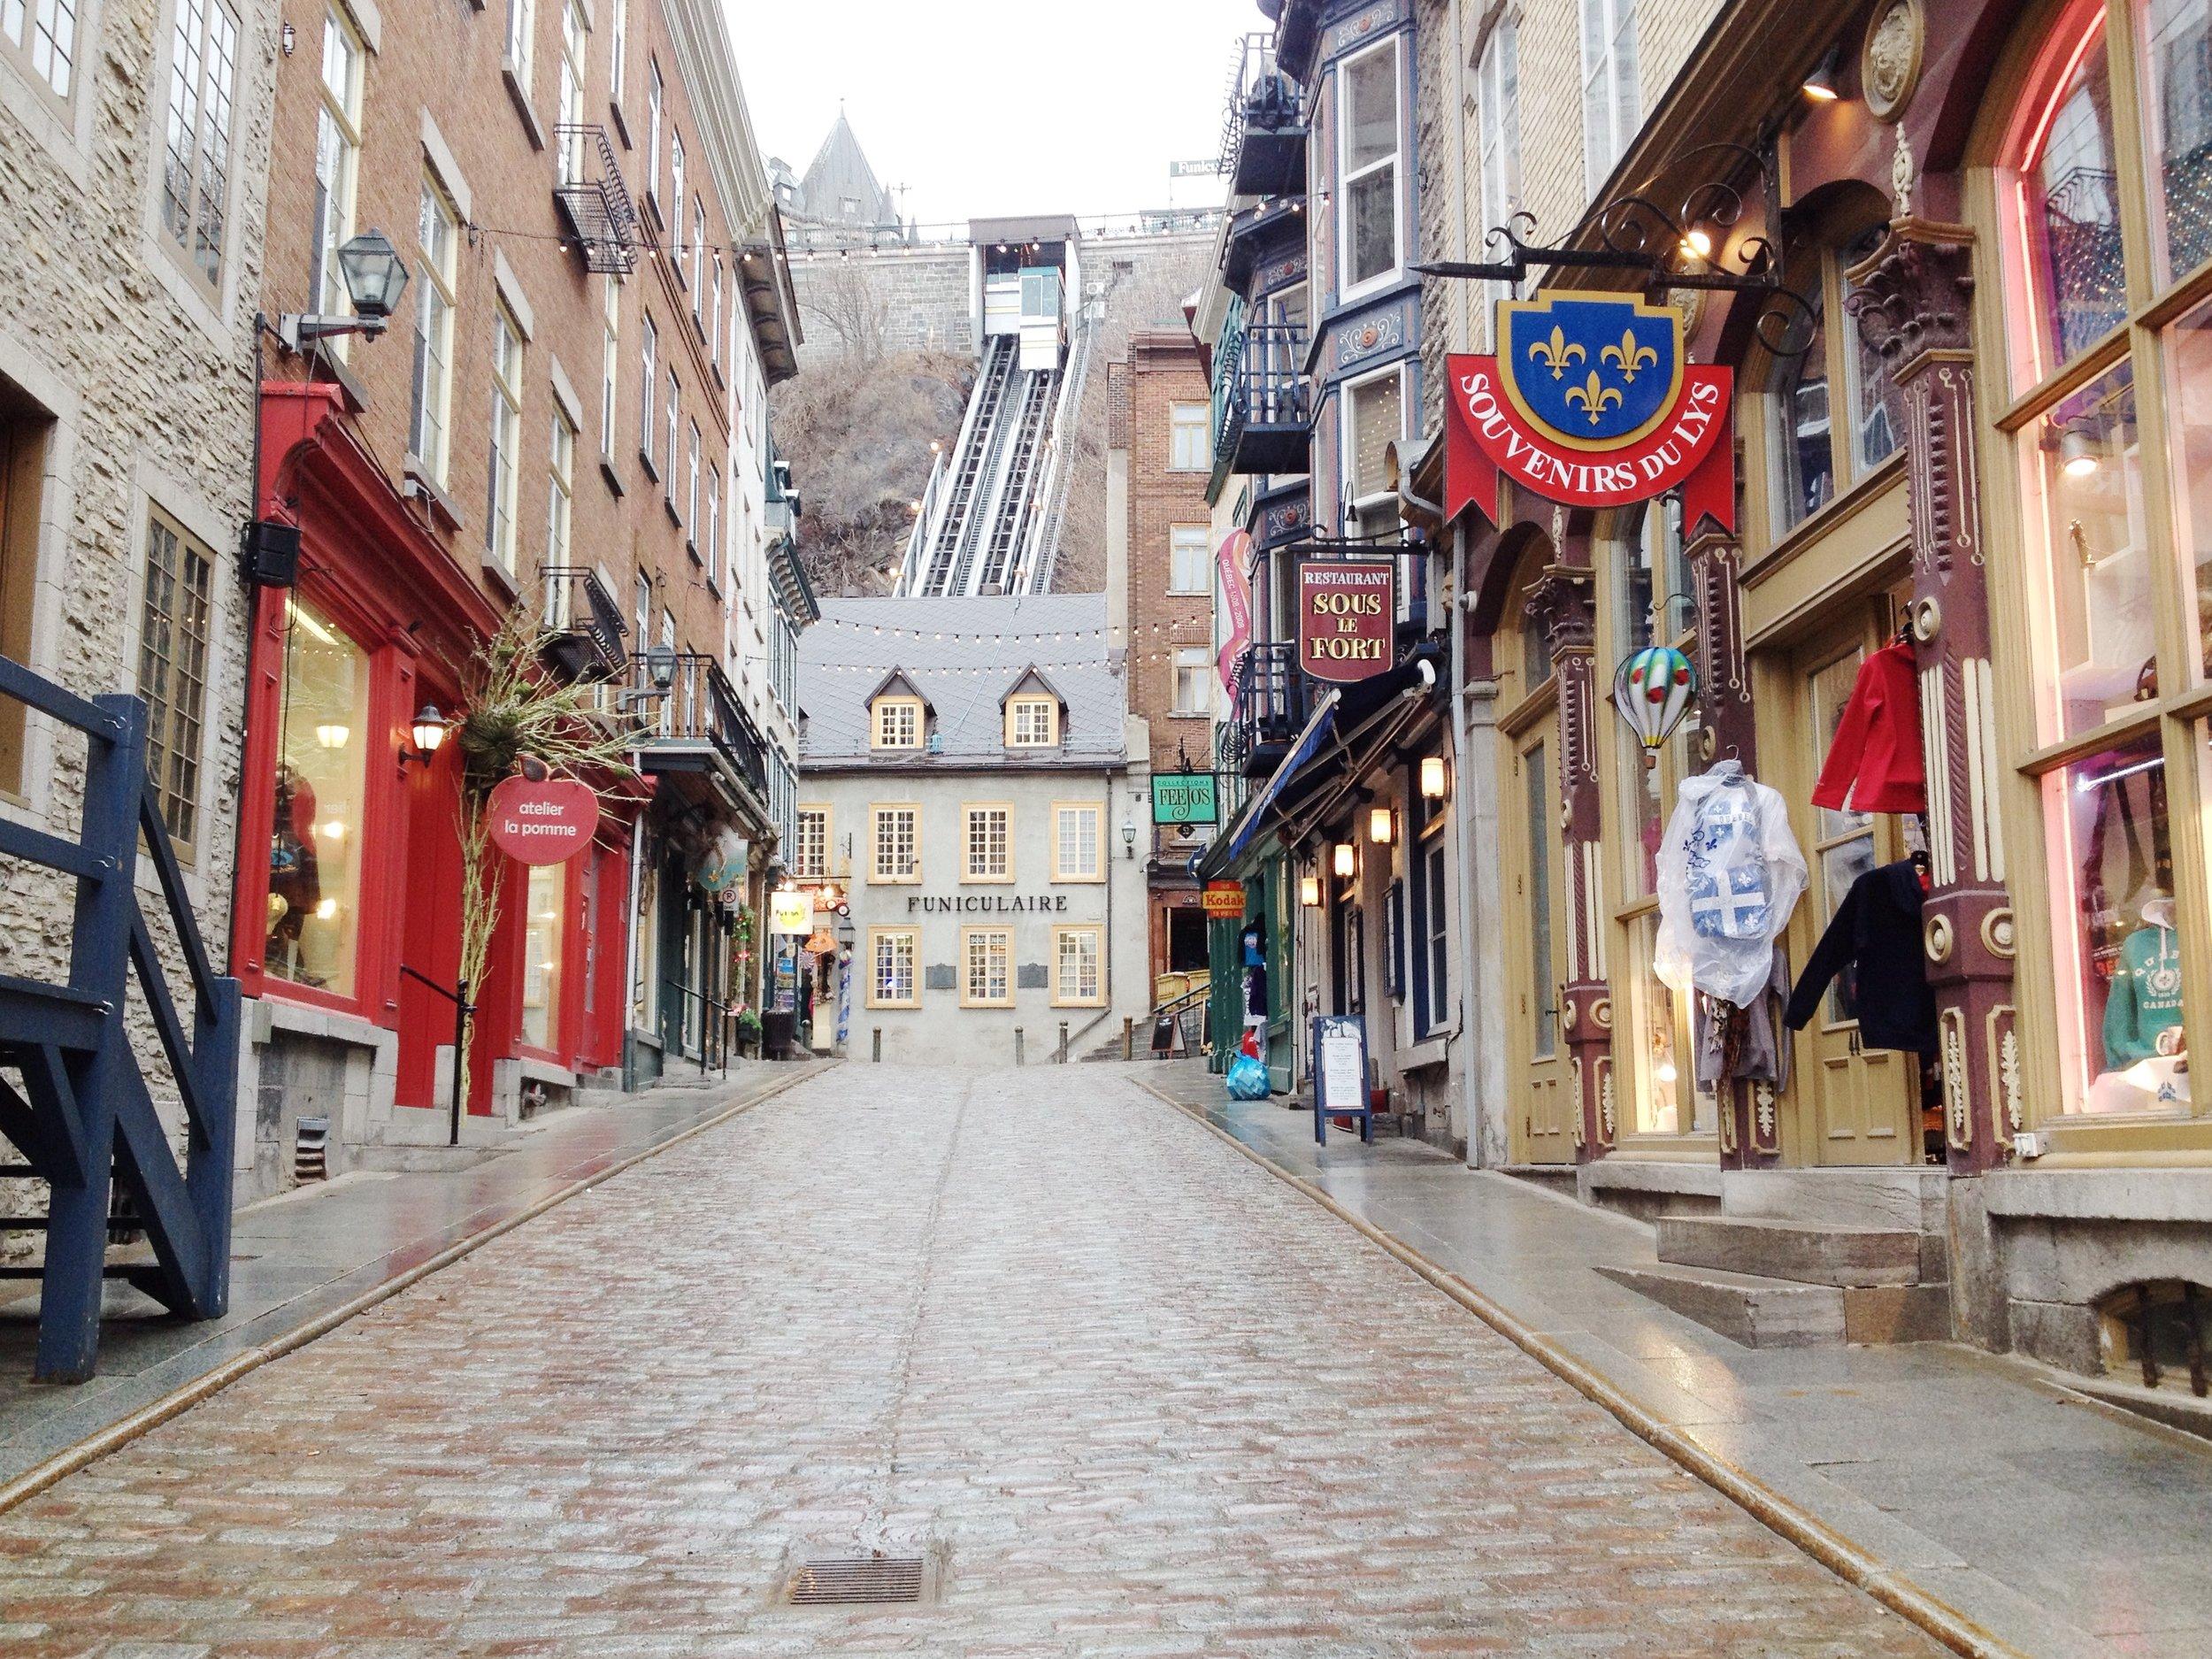 Quebec City! Rainy, but still lovely.